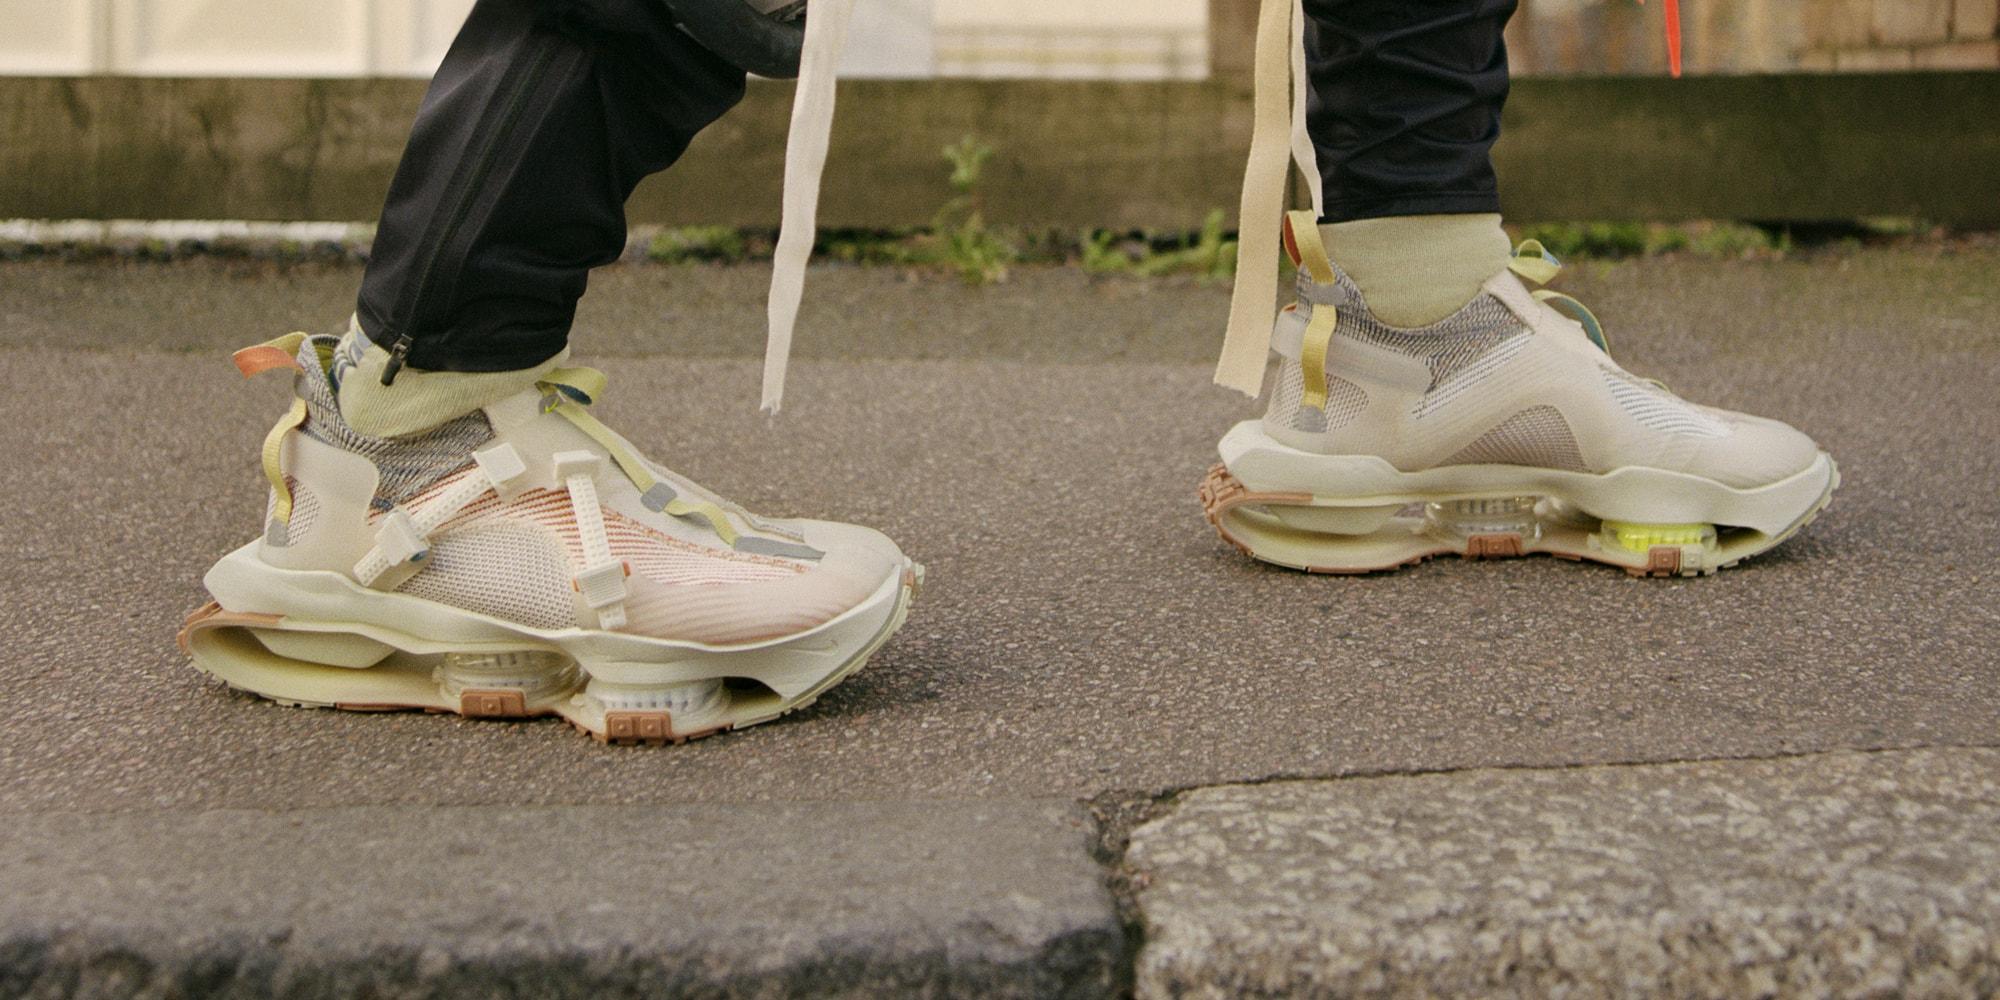 nike adidas jordan brand suicoke reebok Mizuno Maximizer 20 jordan 1 slip on black toe mark gonzales superstar originals schmoo infinity react run flyknit dunk low kentucky pippen 2 ii instaPump Fury beatnik Proenza Schouler Zoom Vomero +5 tavo sandals ispa road warrior neighborhood force 1 rift cortez gore-tex clarks wallabee birkenstock arizona bait toy story a cold wall shiatsu relax best footwear sneakers shoes to wear 2020 pandemic coronavirus work from home stay quarantine isolation social distancing favorite hypebeast editors